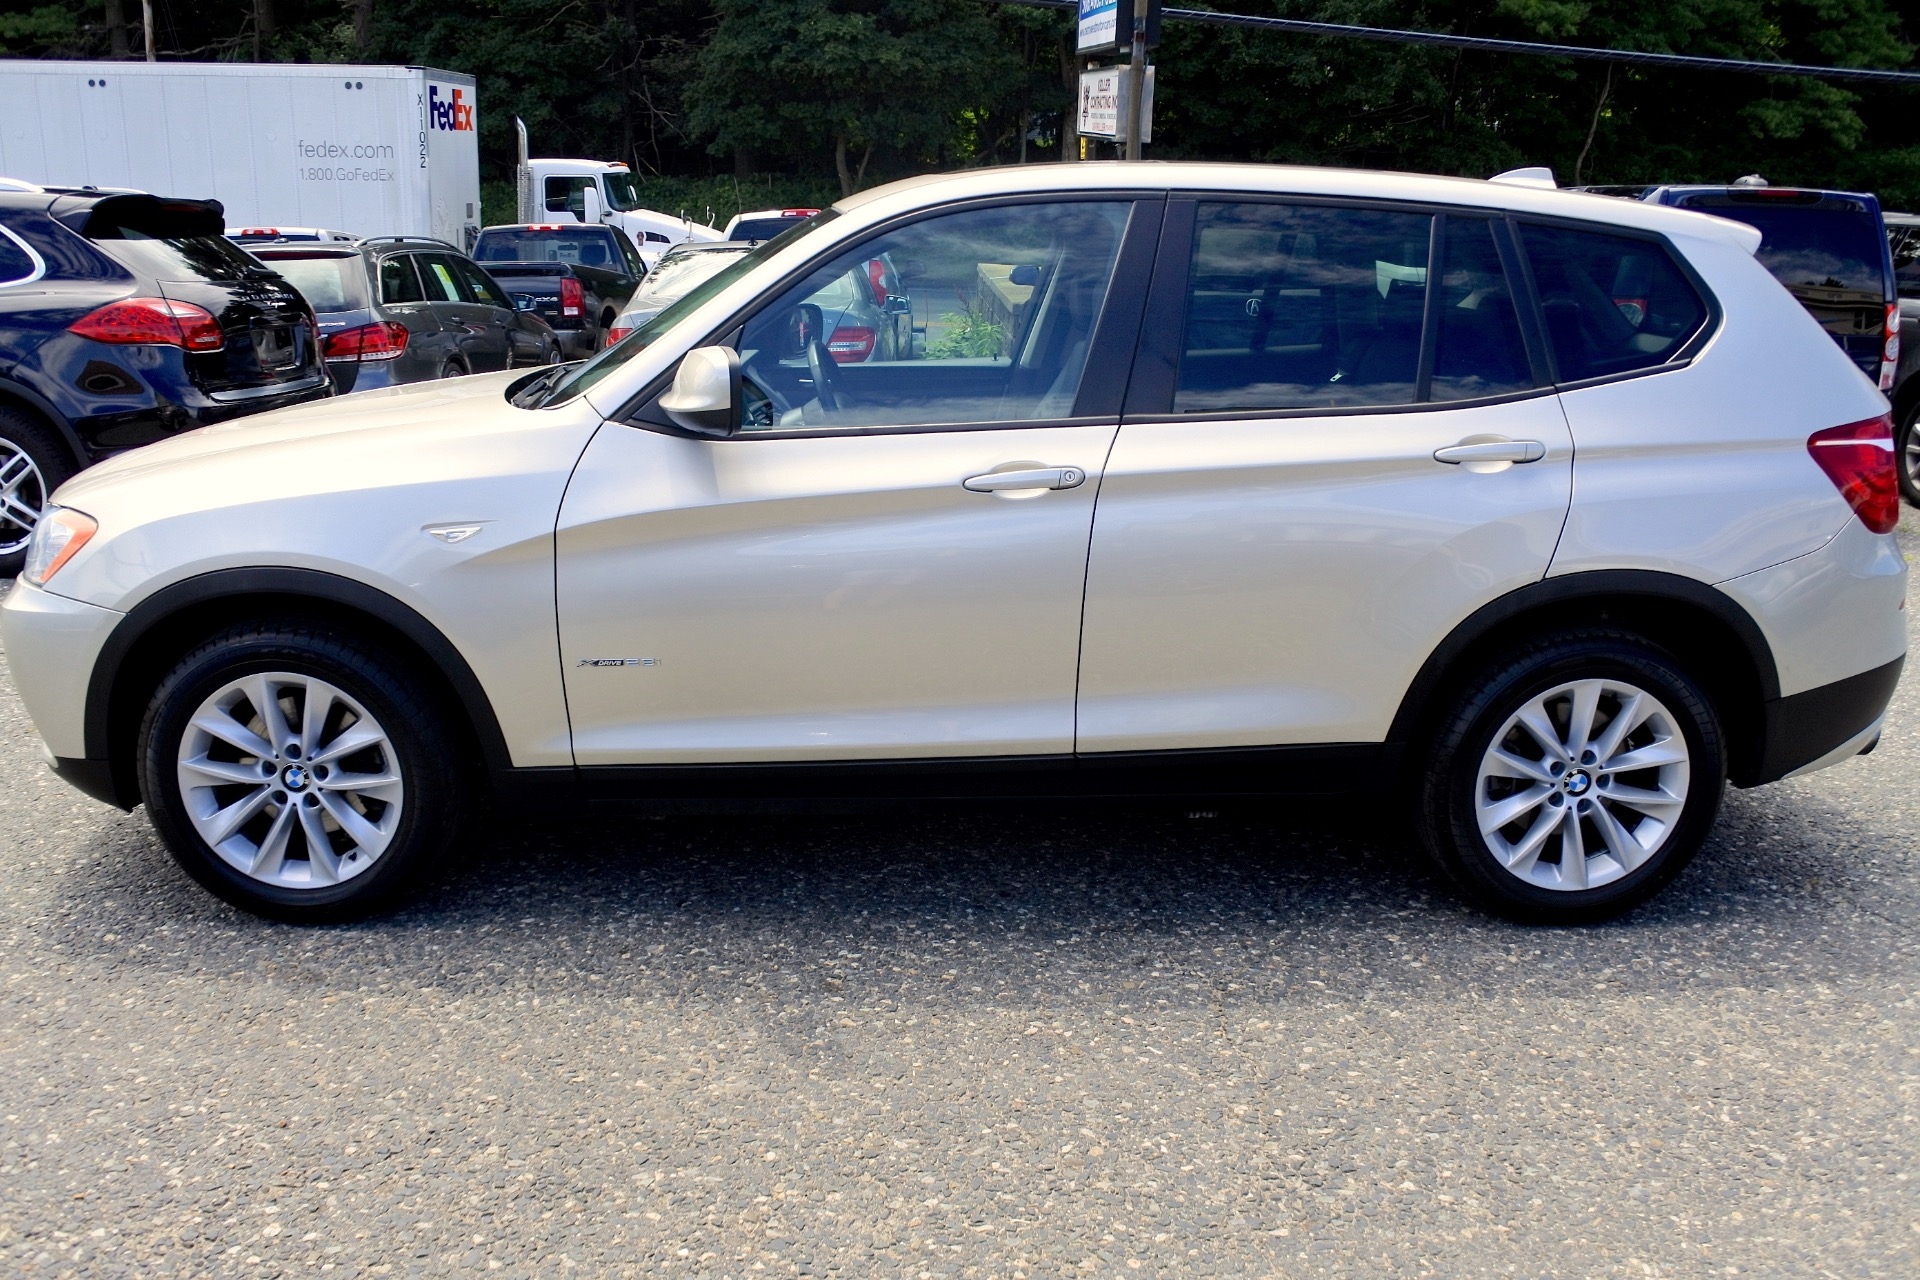 Used 2013 BMW X3 AWD 4dr xDrive28i Used 2013 BMW X3 AWD 4dr xDrive28i for sale  at Metro West Motorcars LLC in Shrewsbury MA 2